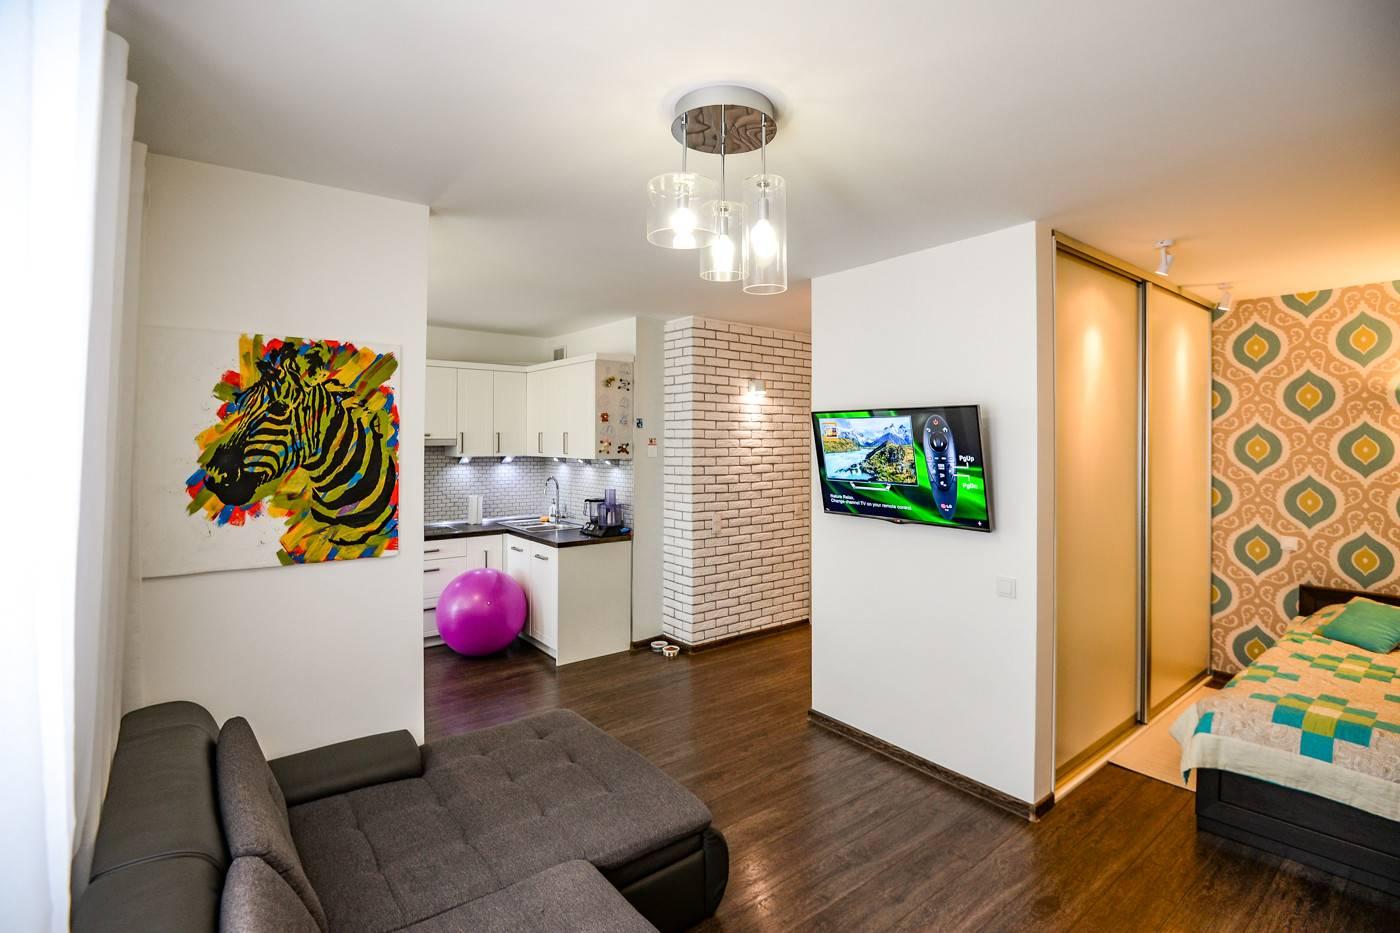 Ремонт однокомнатной квартиры: дизайн + идеи   gd-home.com